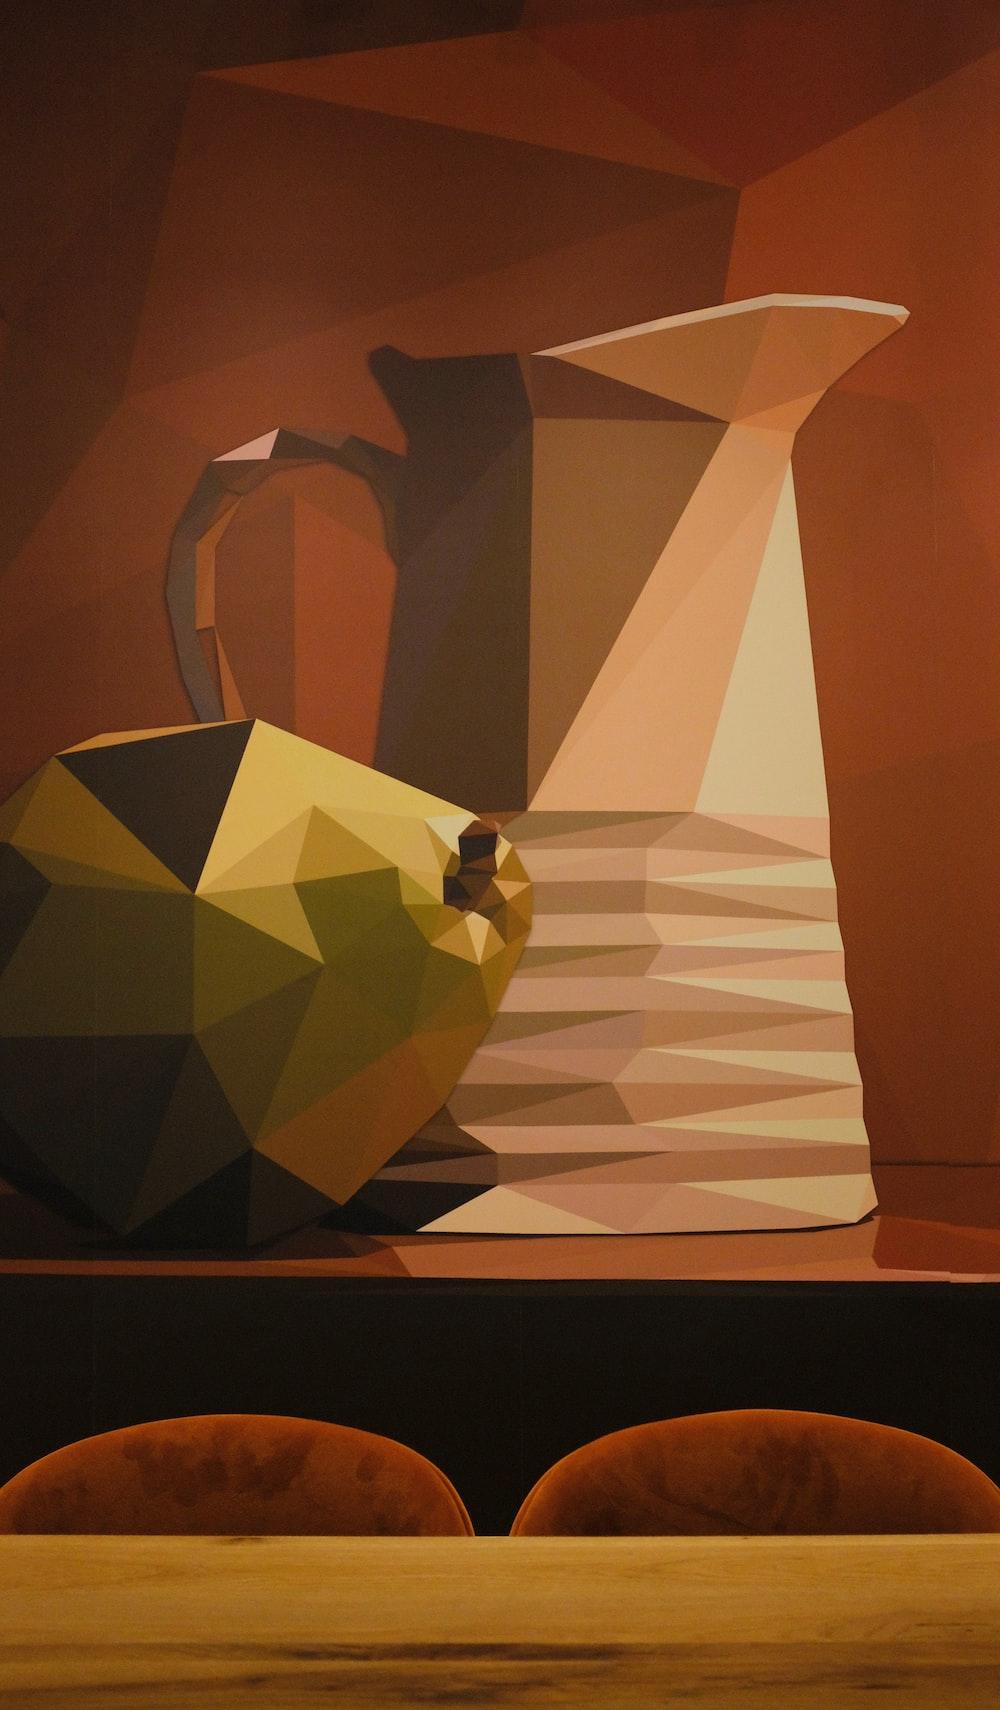 pitcher and vase artwork